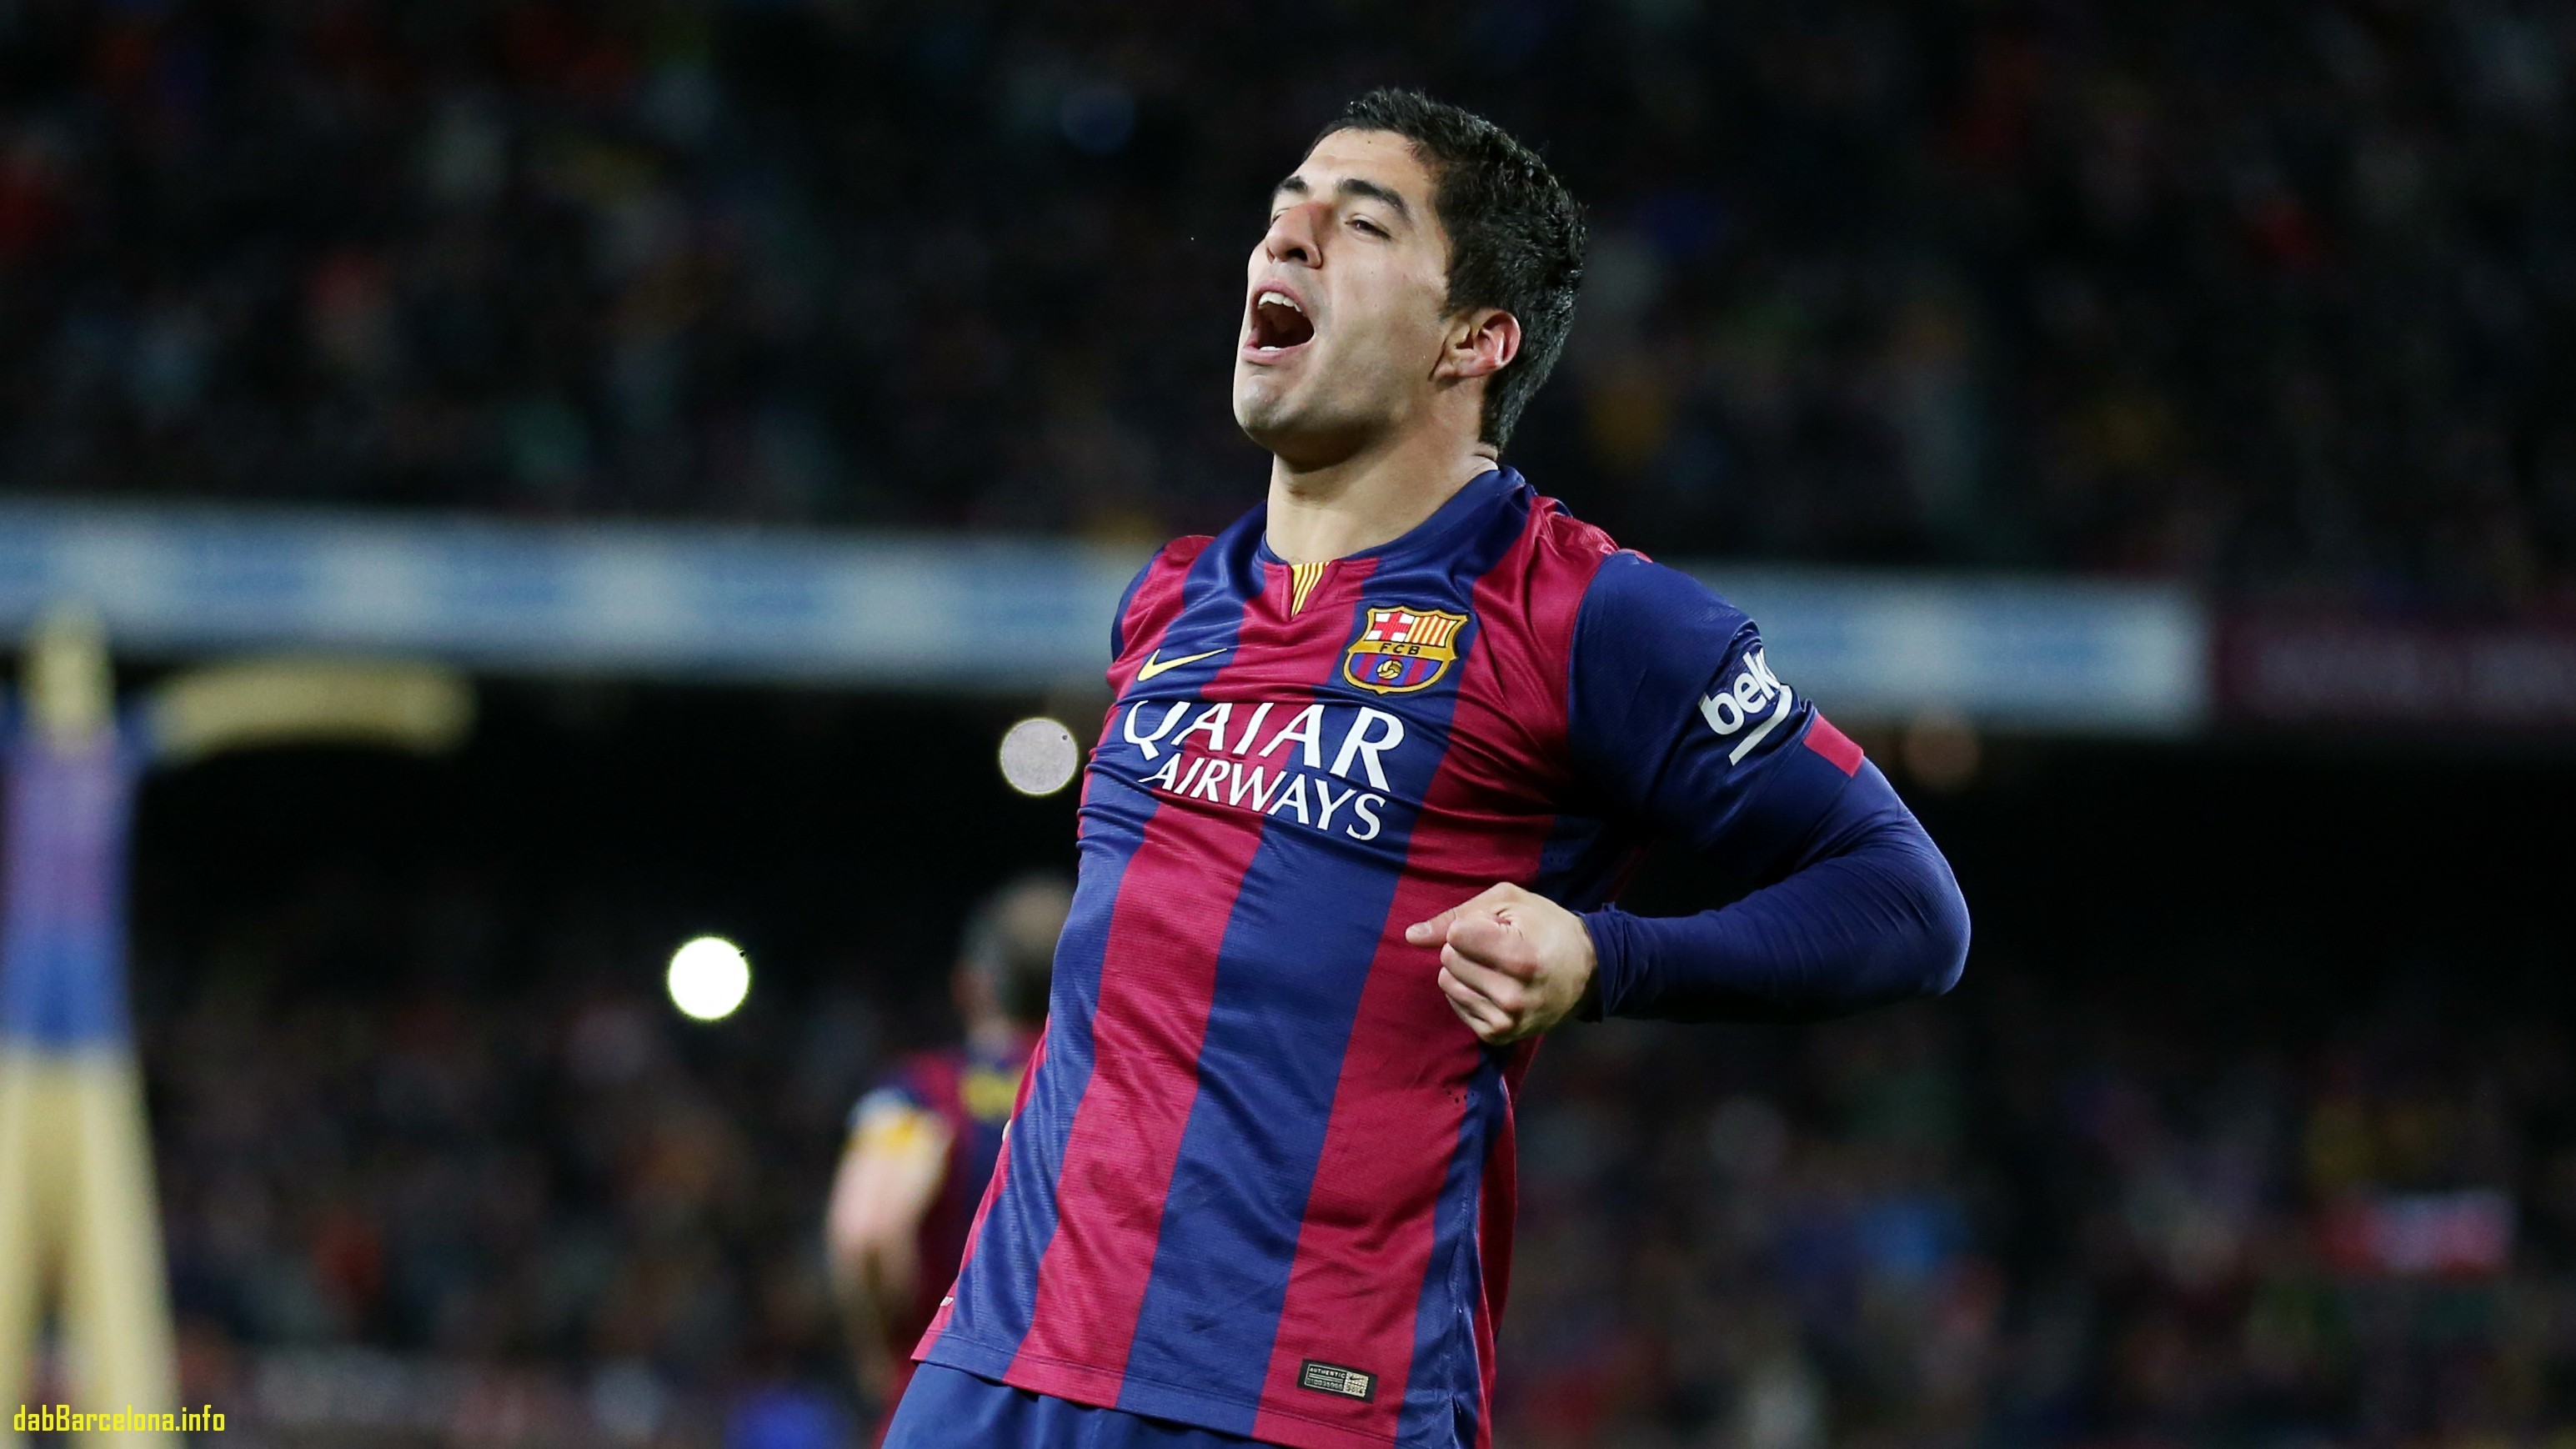 Best Of Estadisticas Luis Suarez Fc Barcelona Zat3